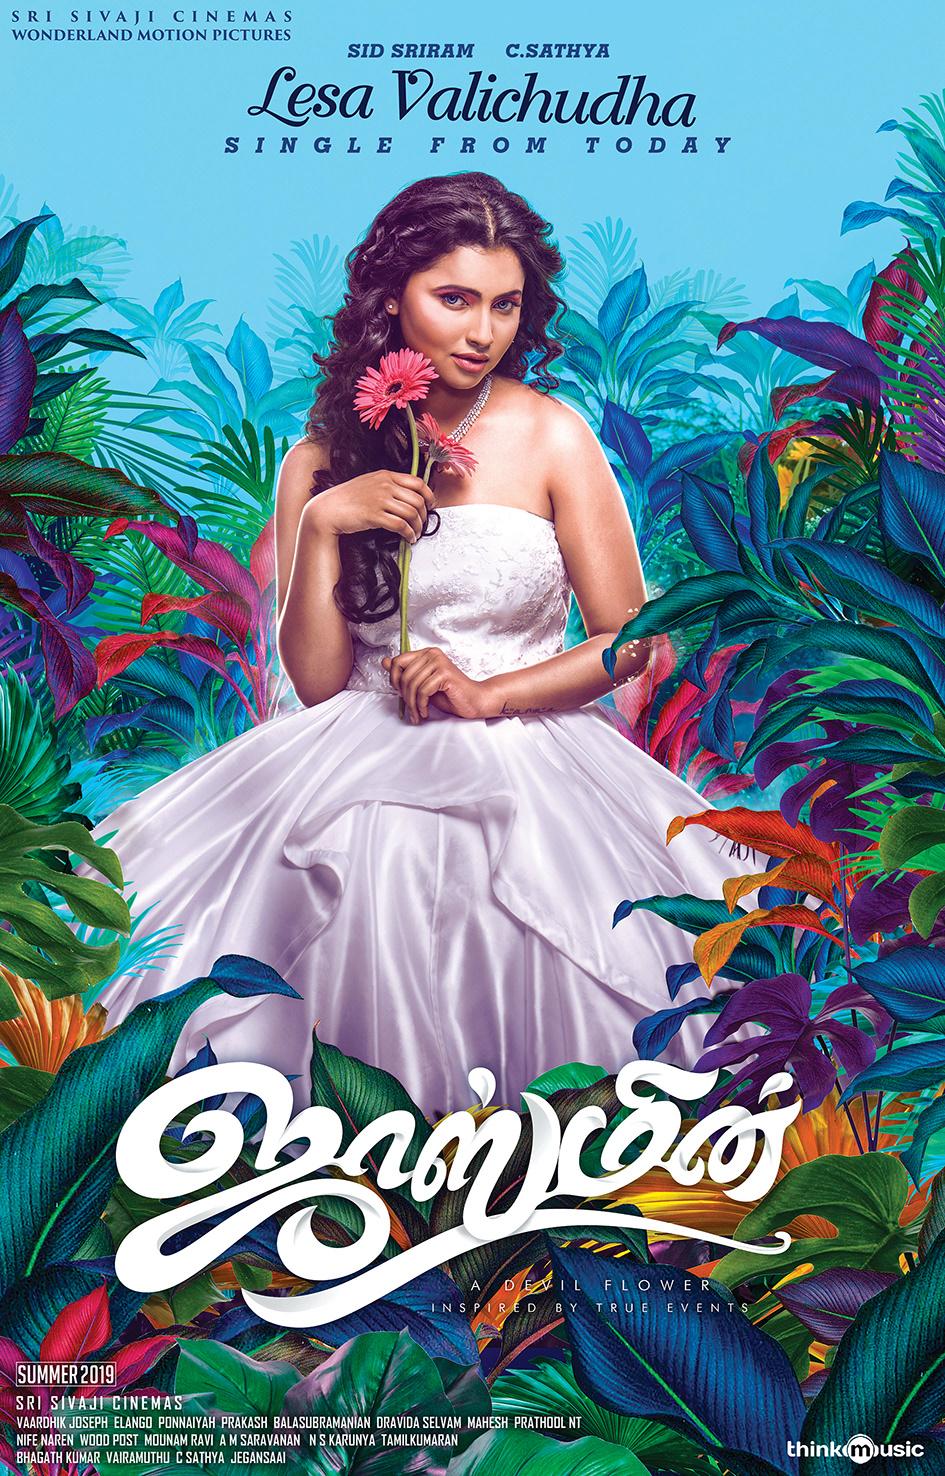 2nd poster of movie JASMINE on Behance